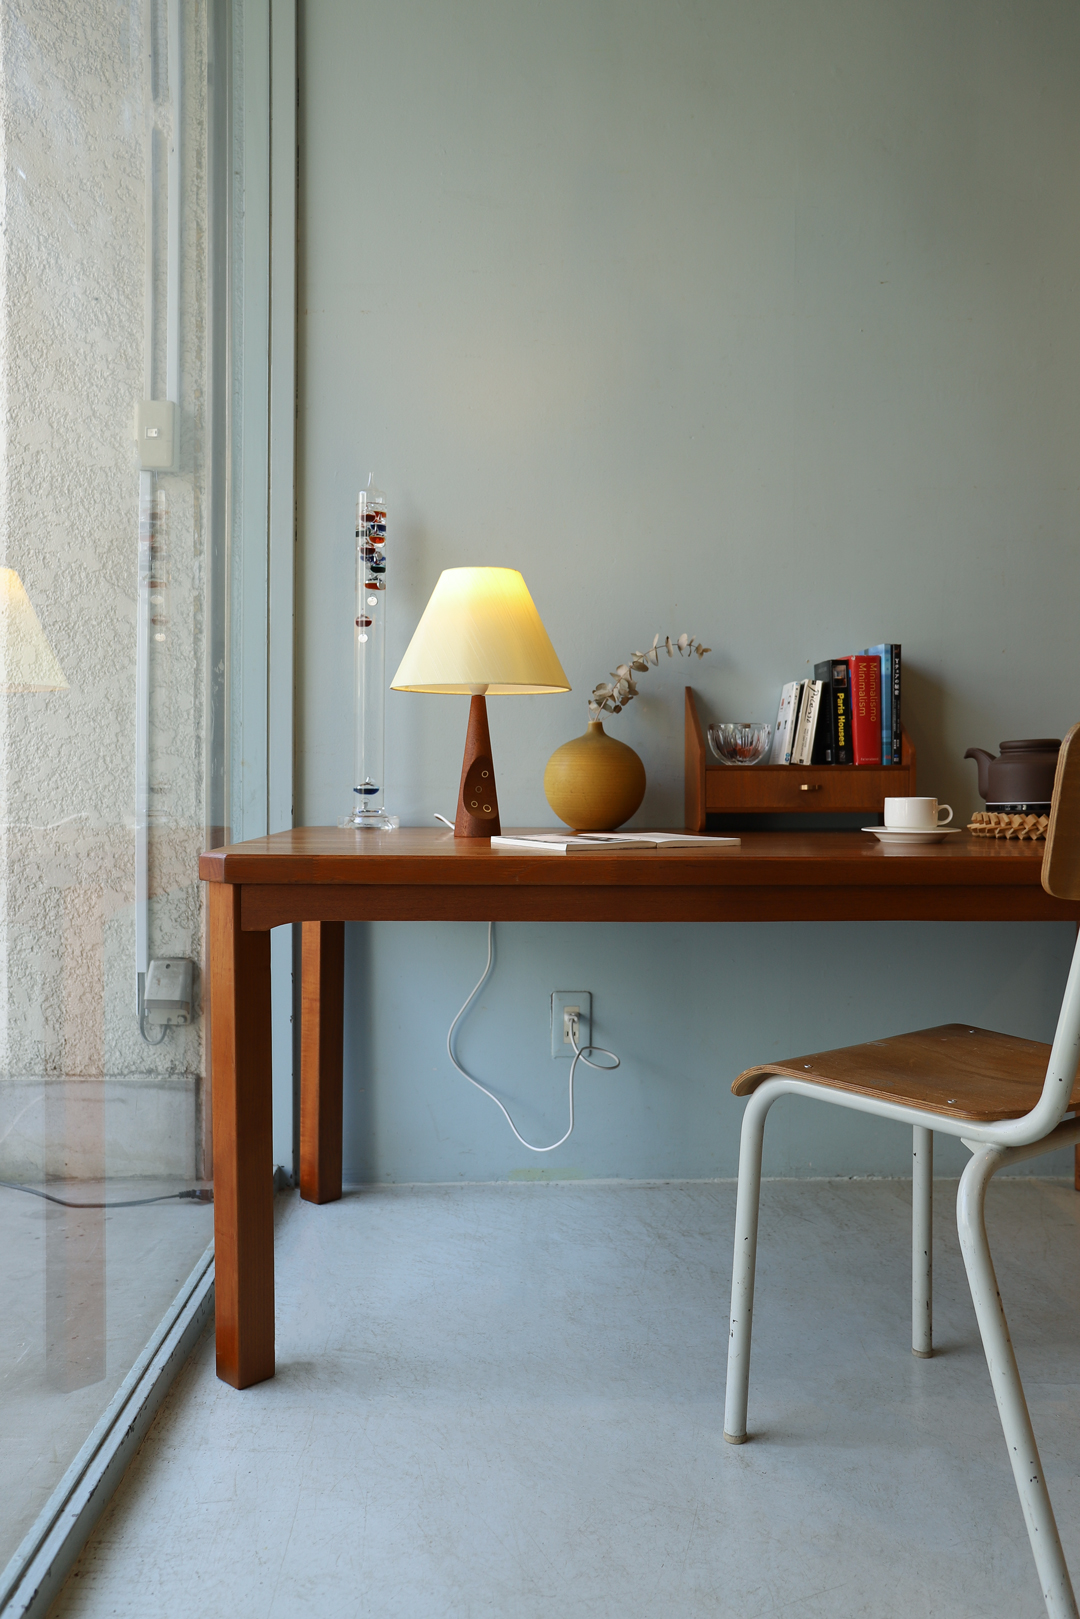 Danish Vintage Teakwood Brass Table Lamp/デンマークヴィンテージ テーブルランプ チーク材×真鍮 ミッドセンチュリーモダン インテリア 北欧デザイン